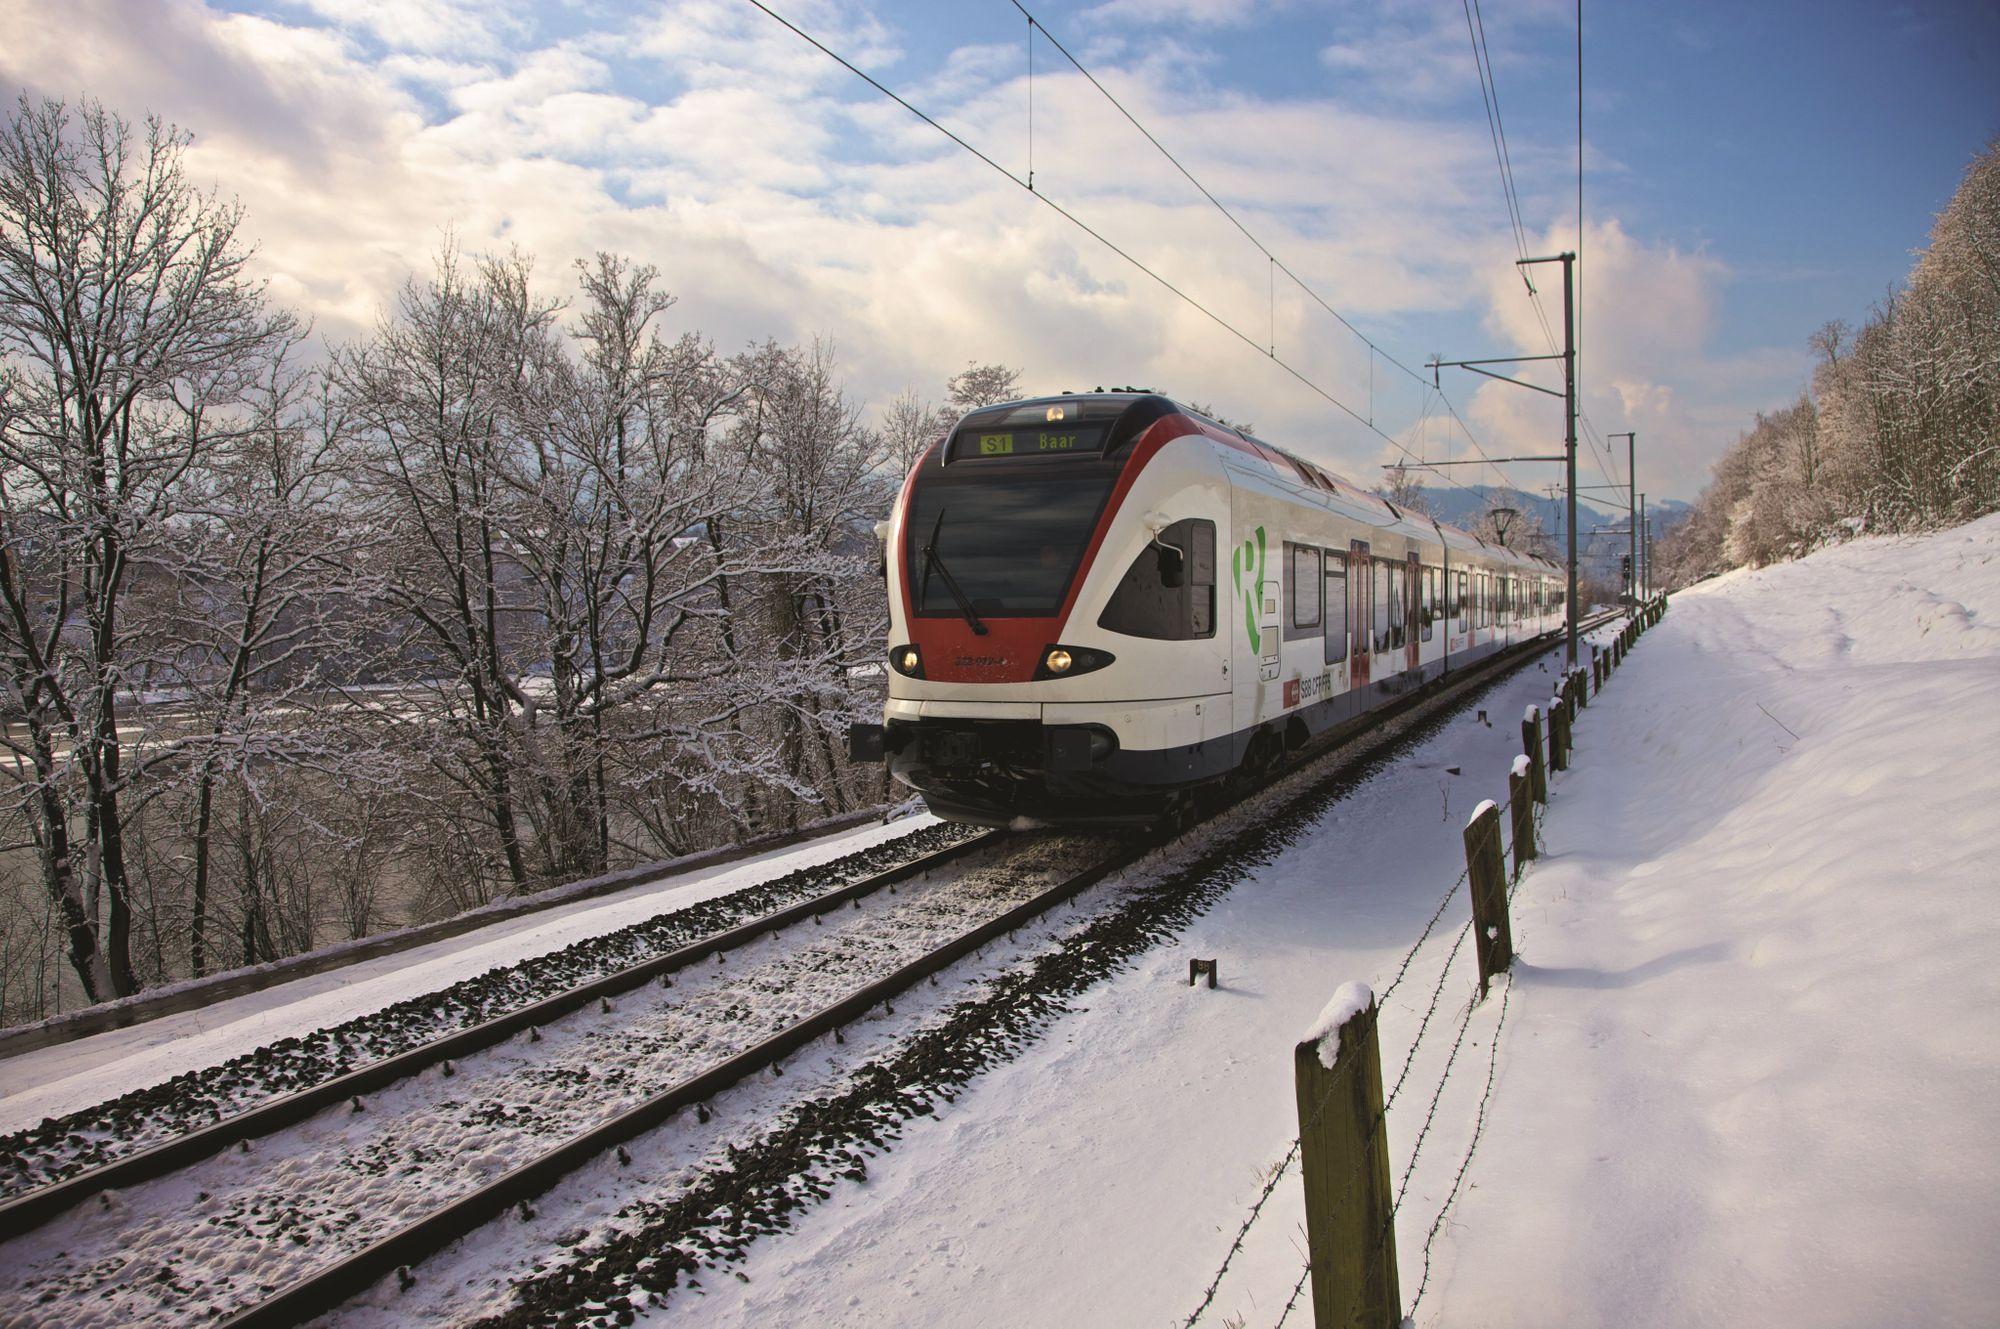 Europa en Invierno Con Rail Europe